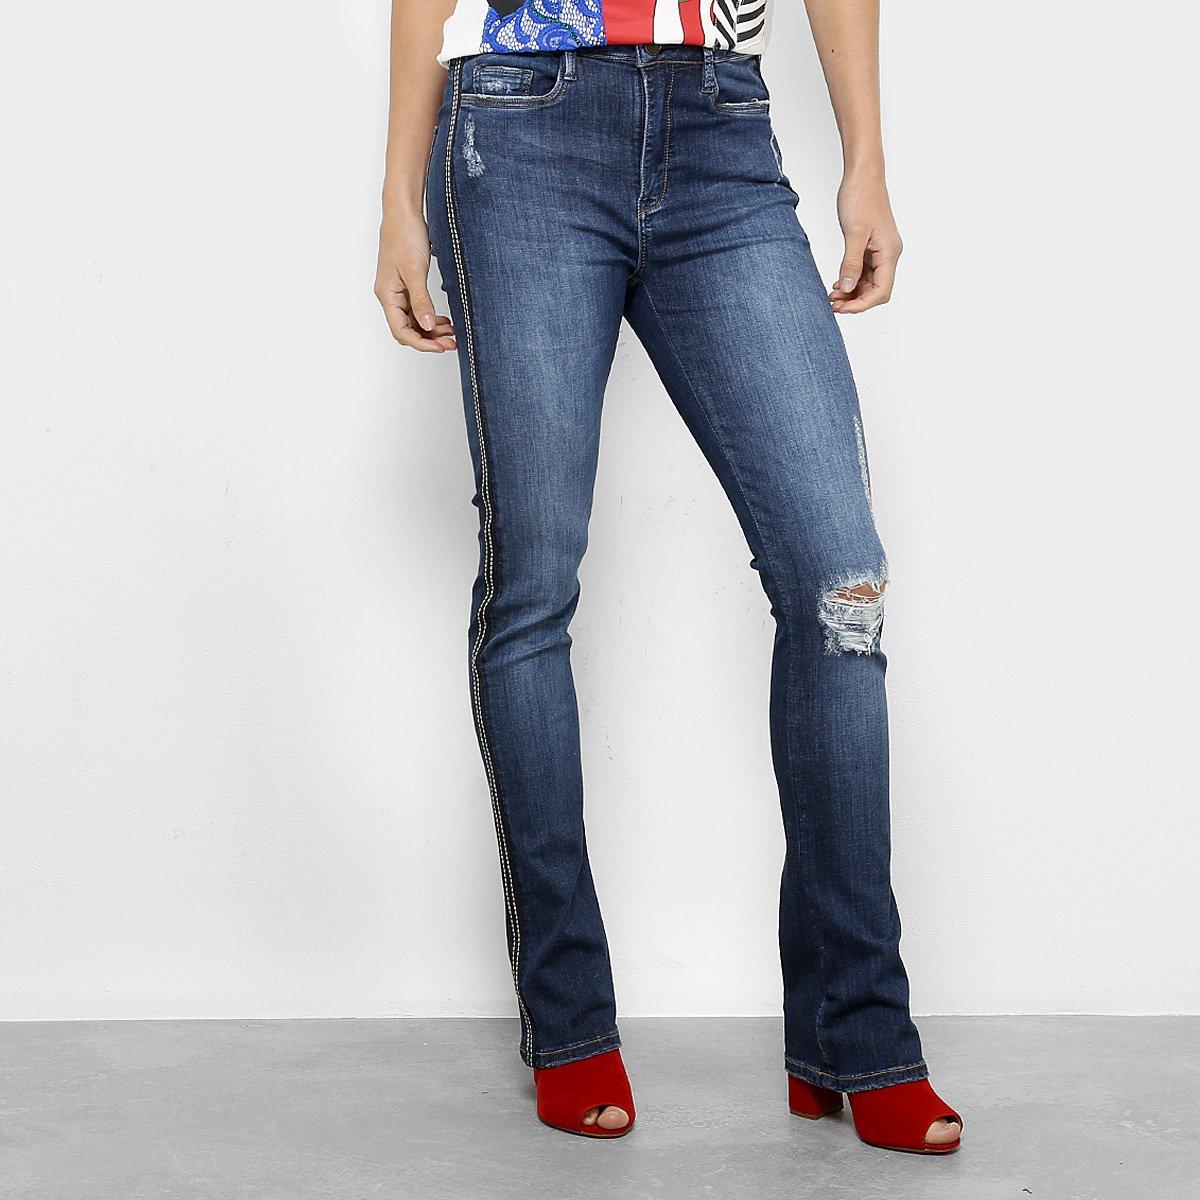 65d4364c5 Calça Jeans Flare Carmim Valparaiso Estonada Cintura Média Feminina